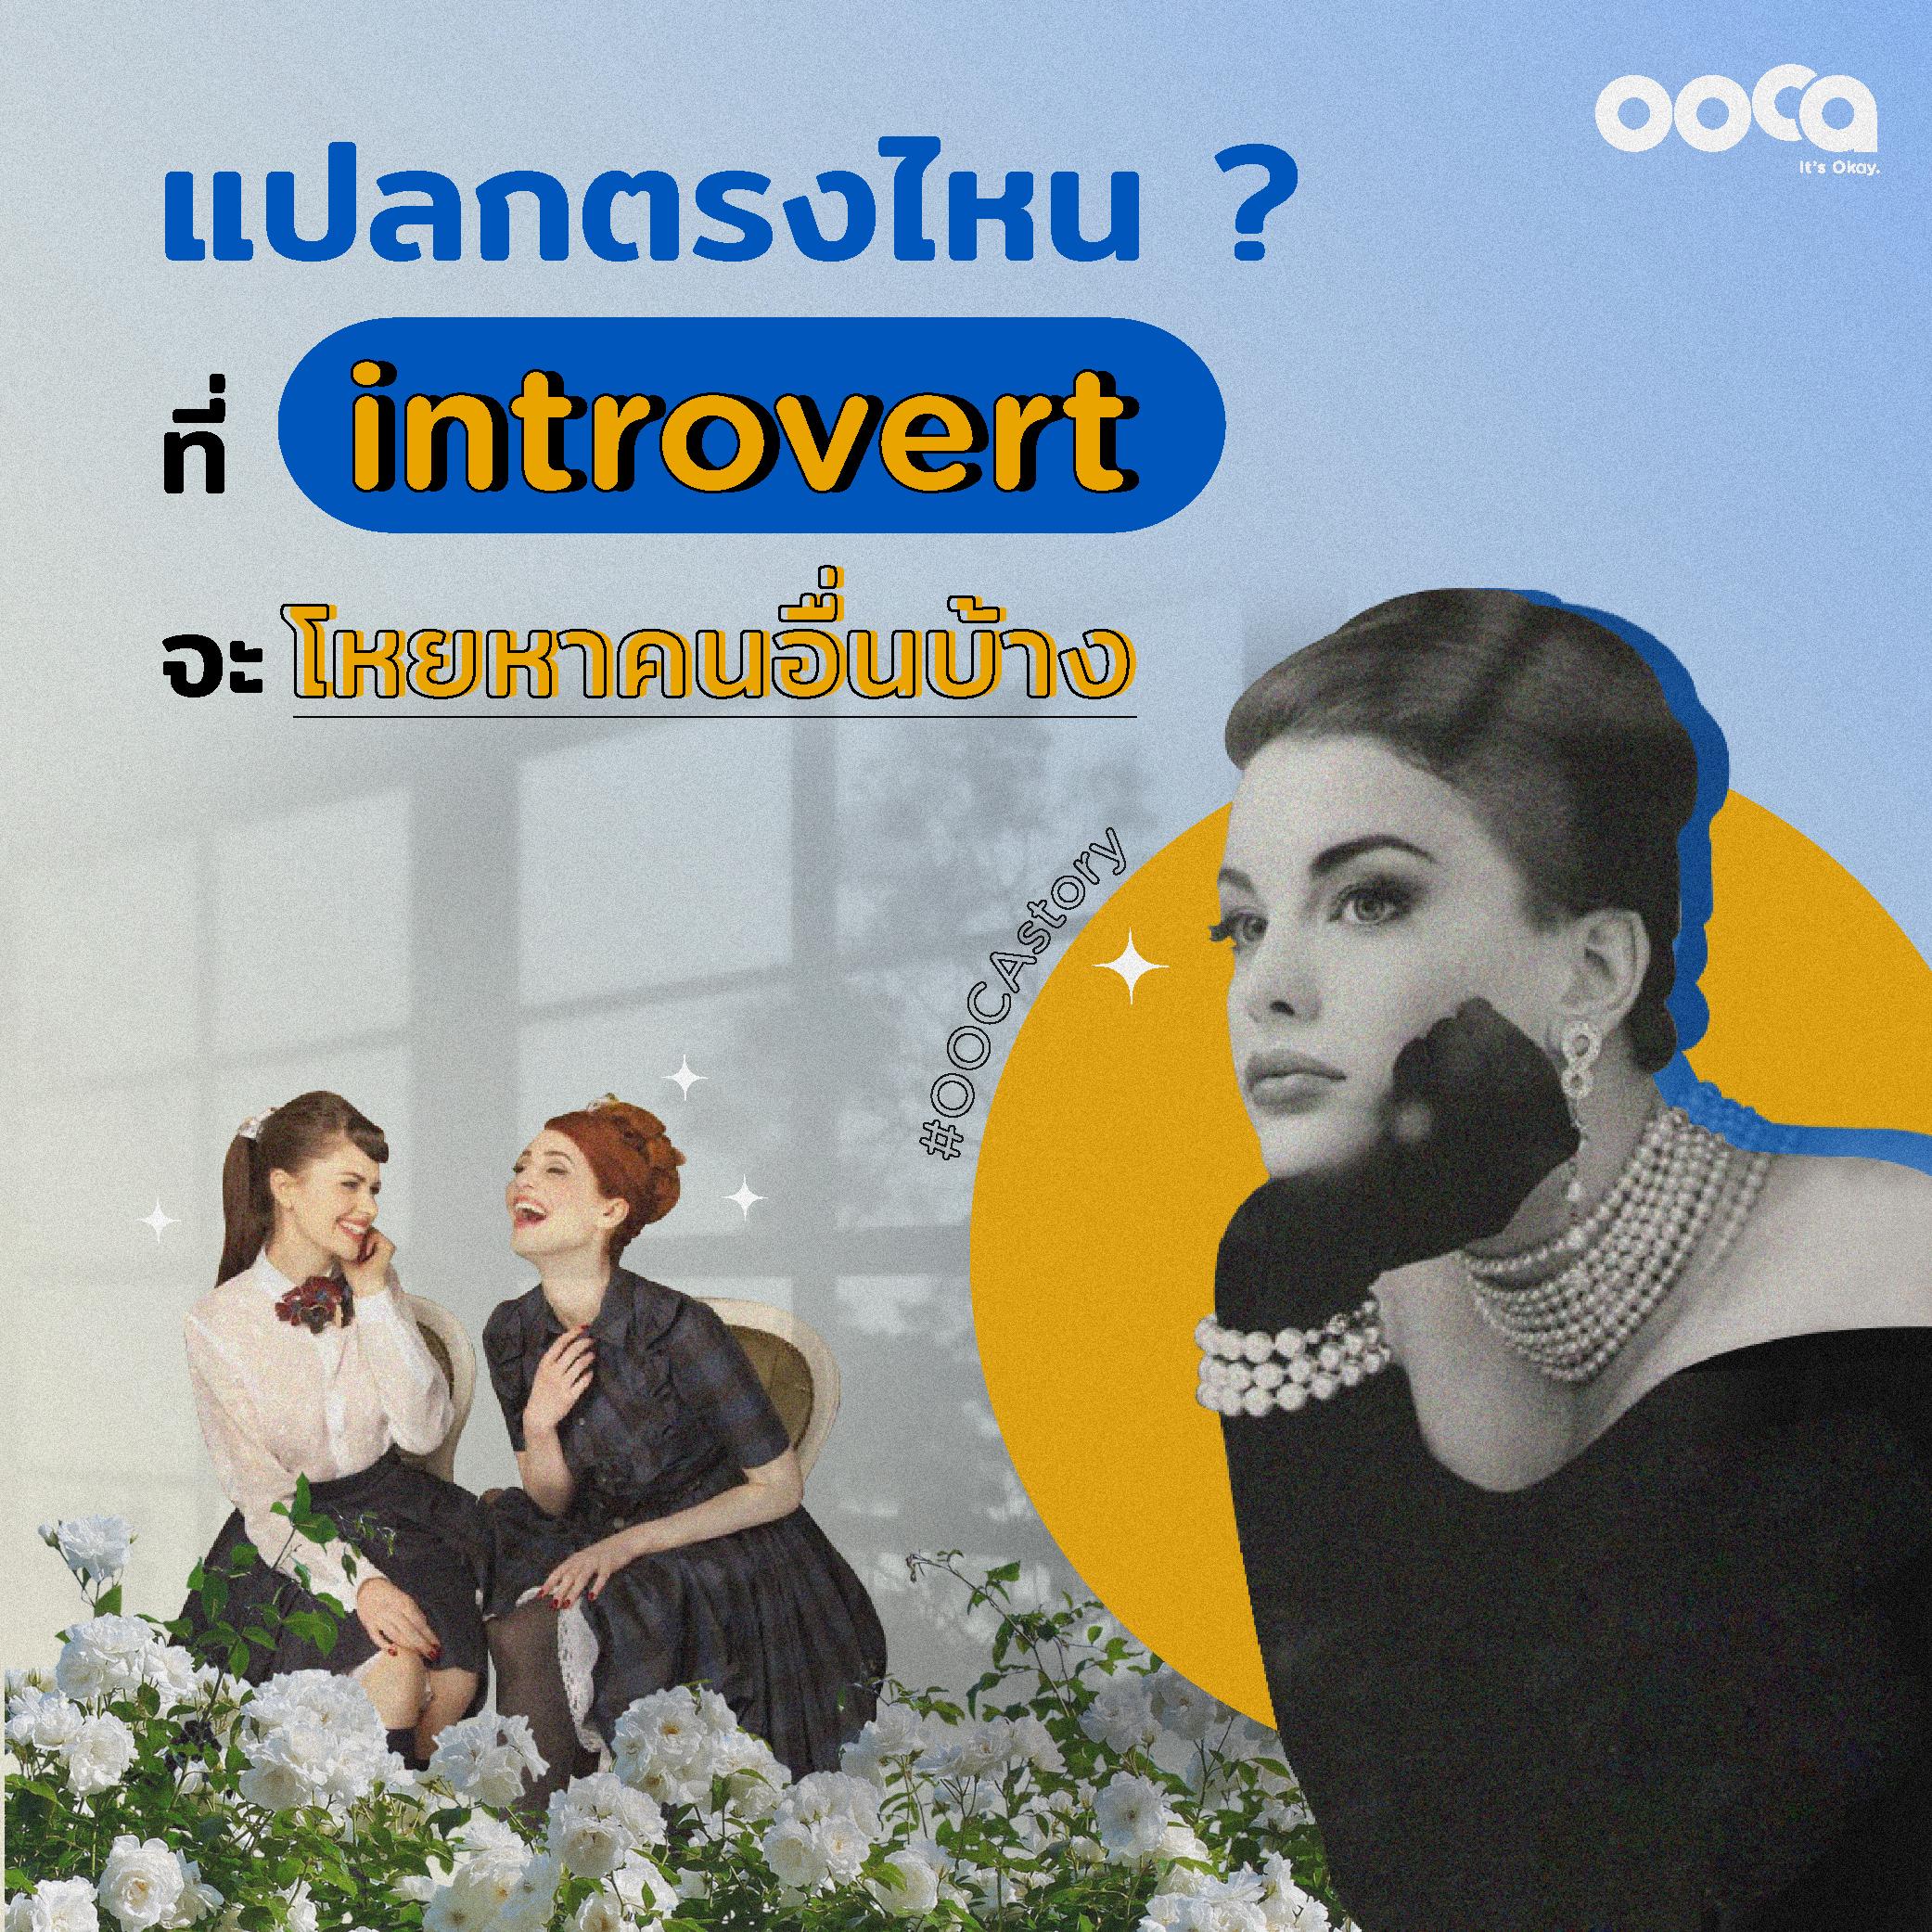 introvert ซึมเศร้า พบจิตแพทย์